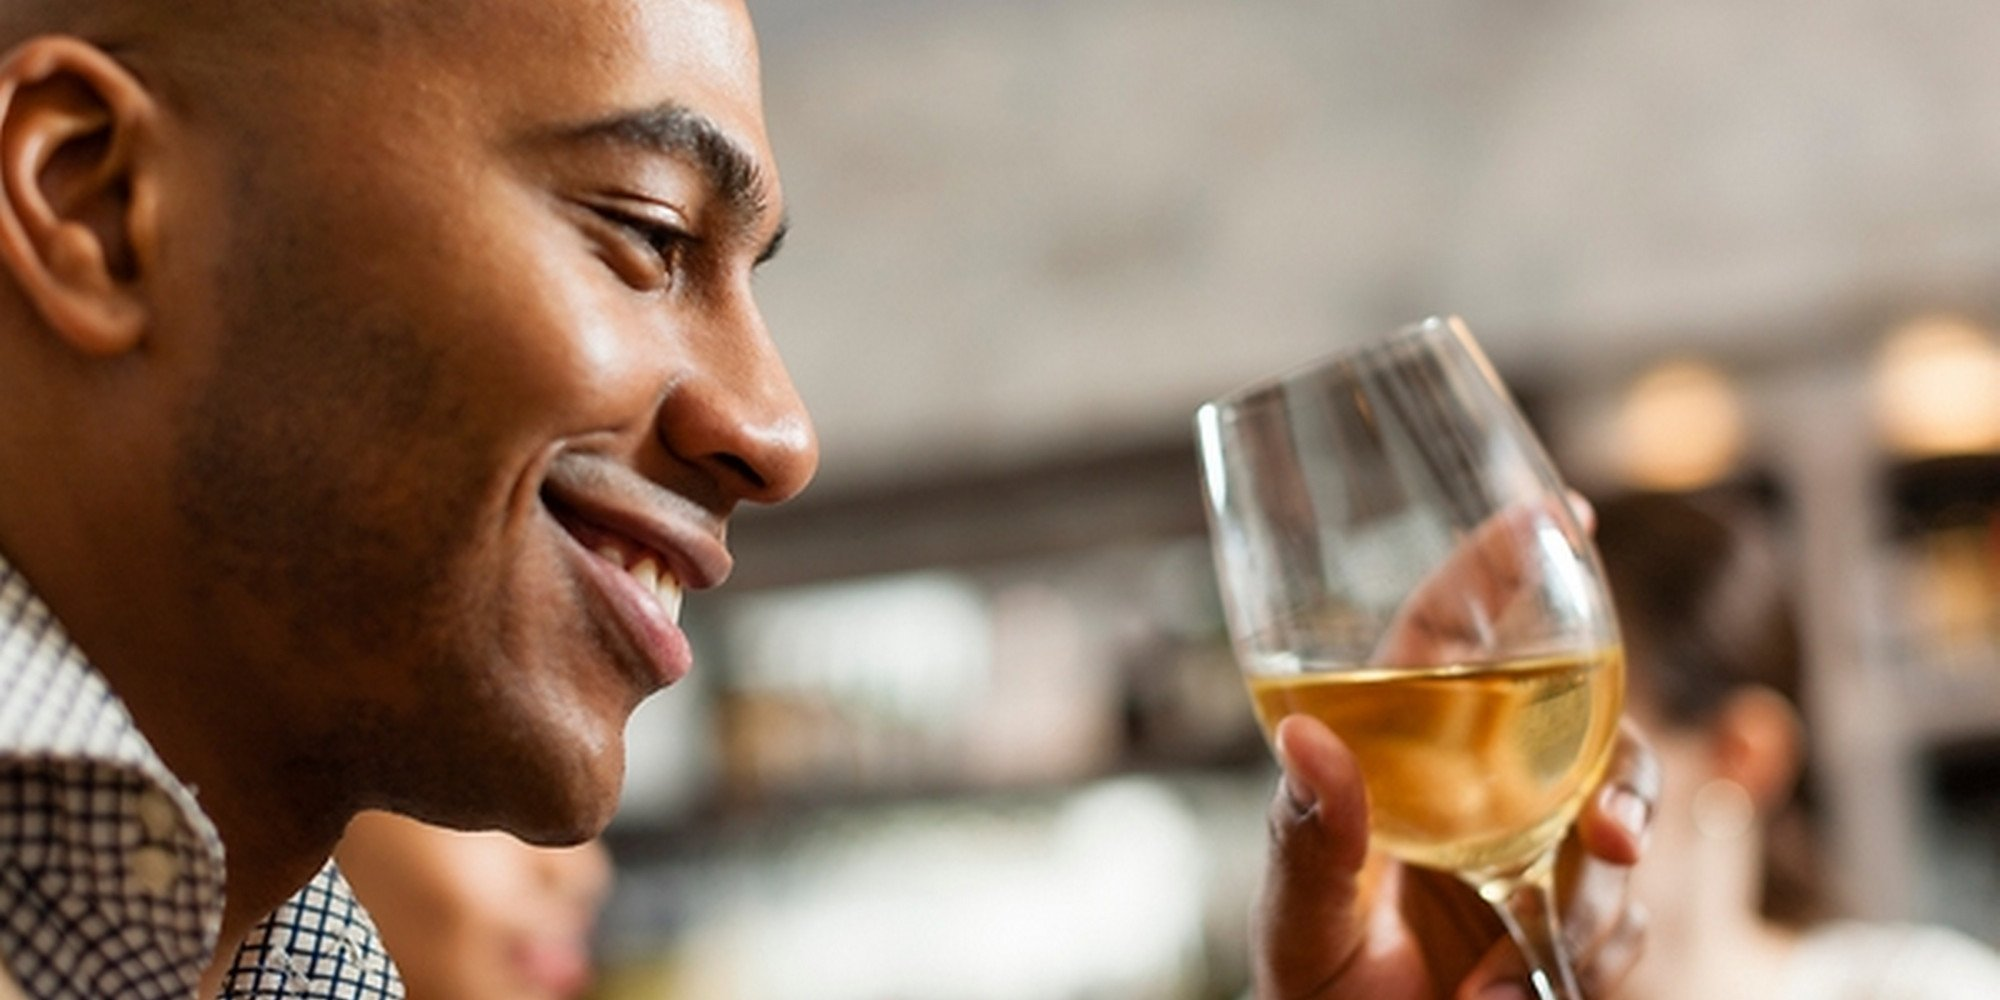 advantage and disadvantage of drinking alcohol